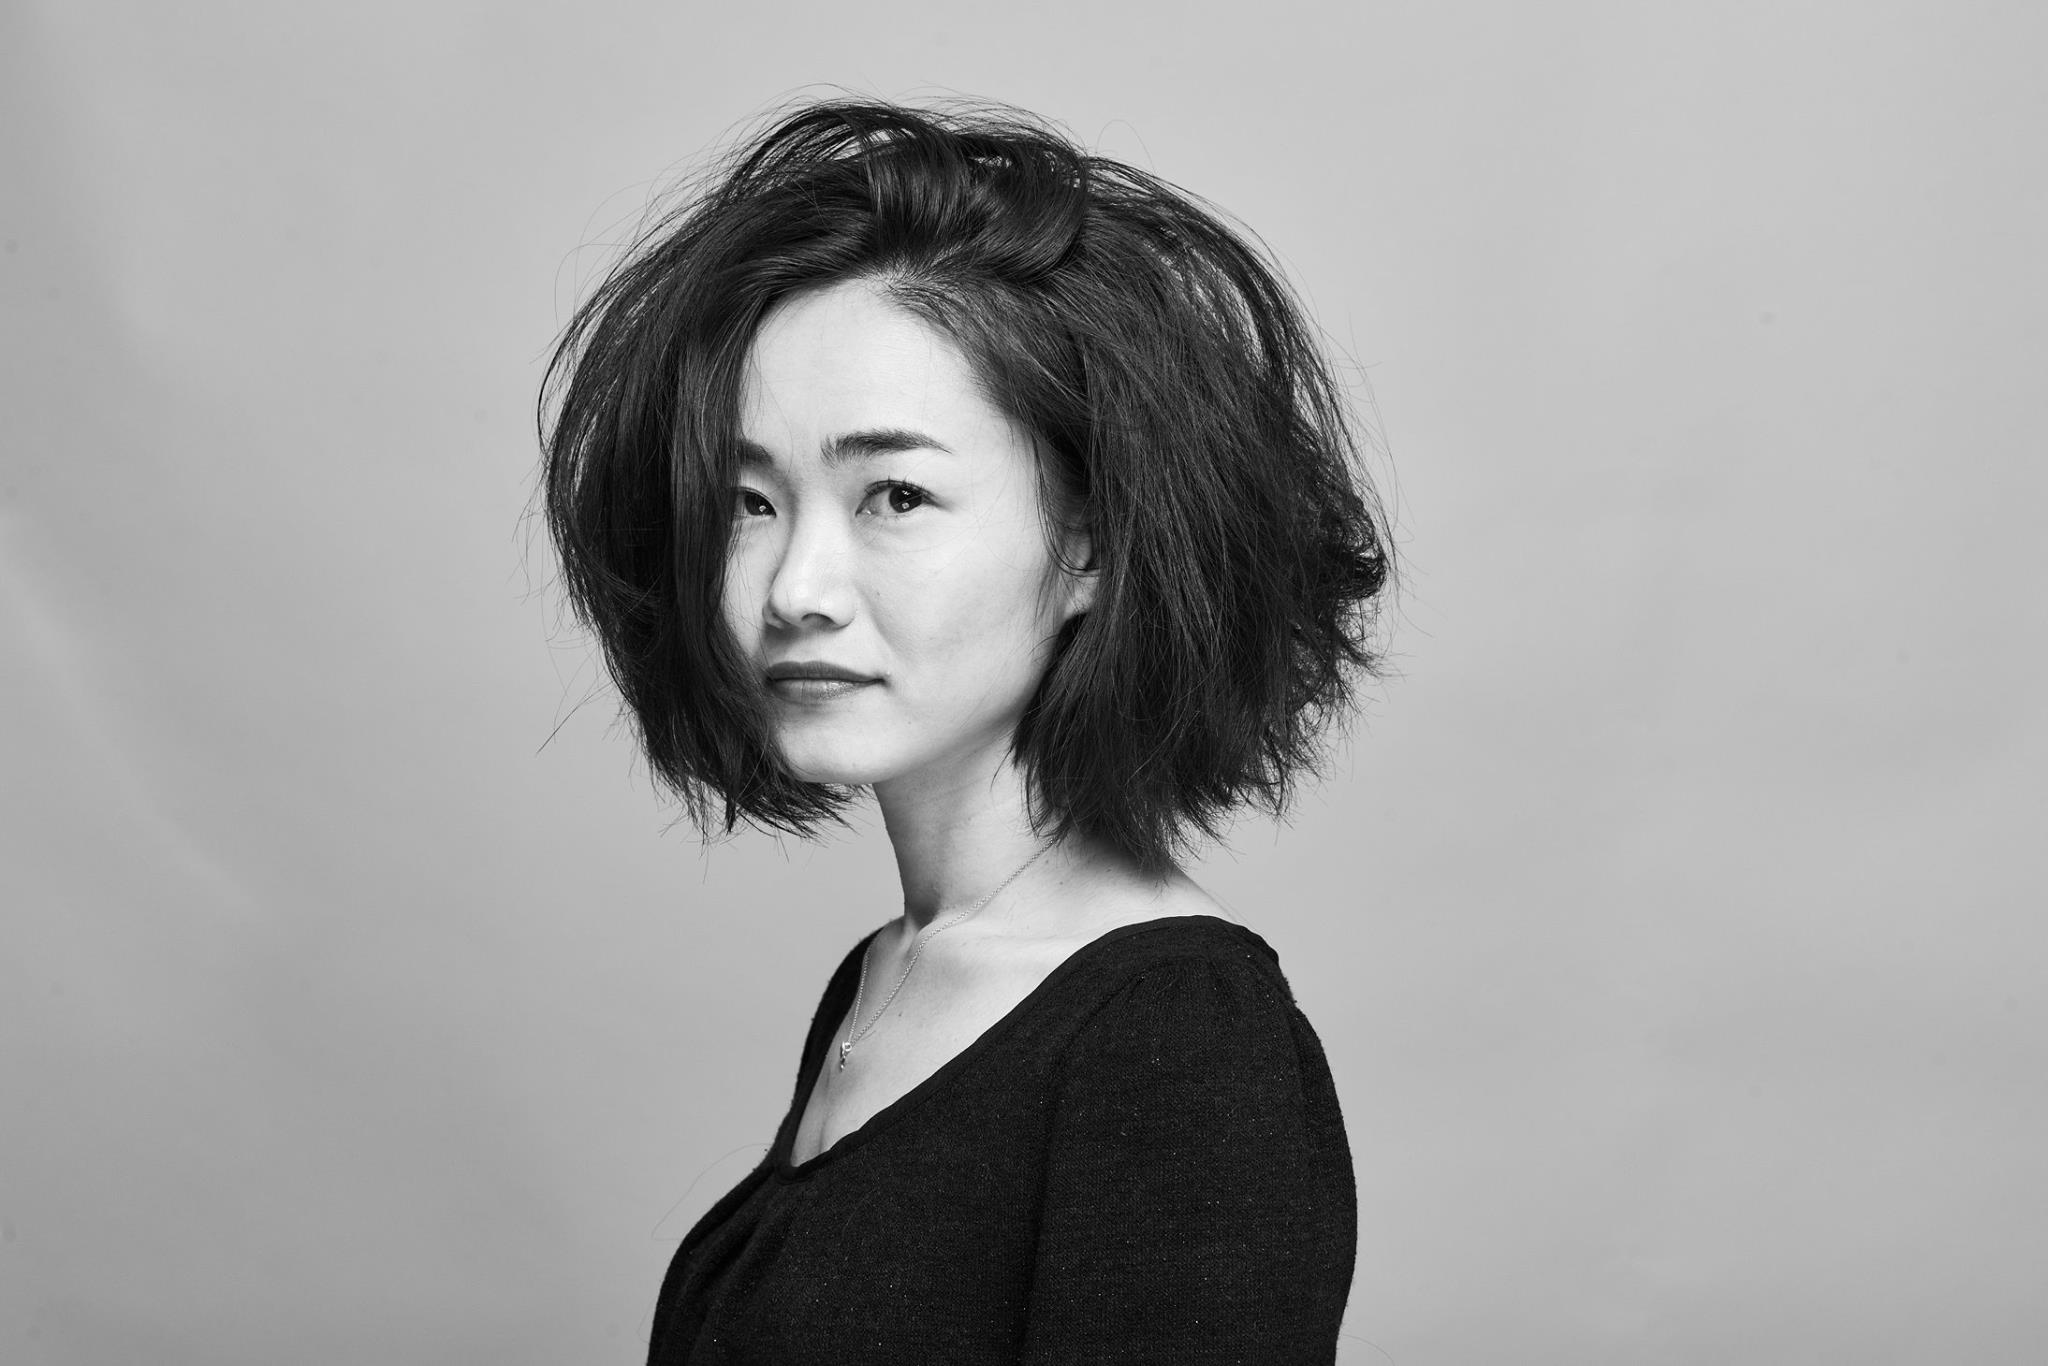 Azumi Tsutsui by Oribe